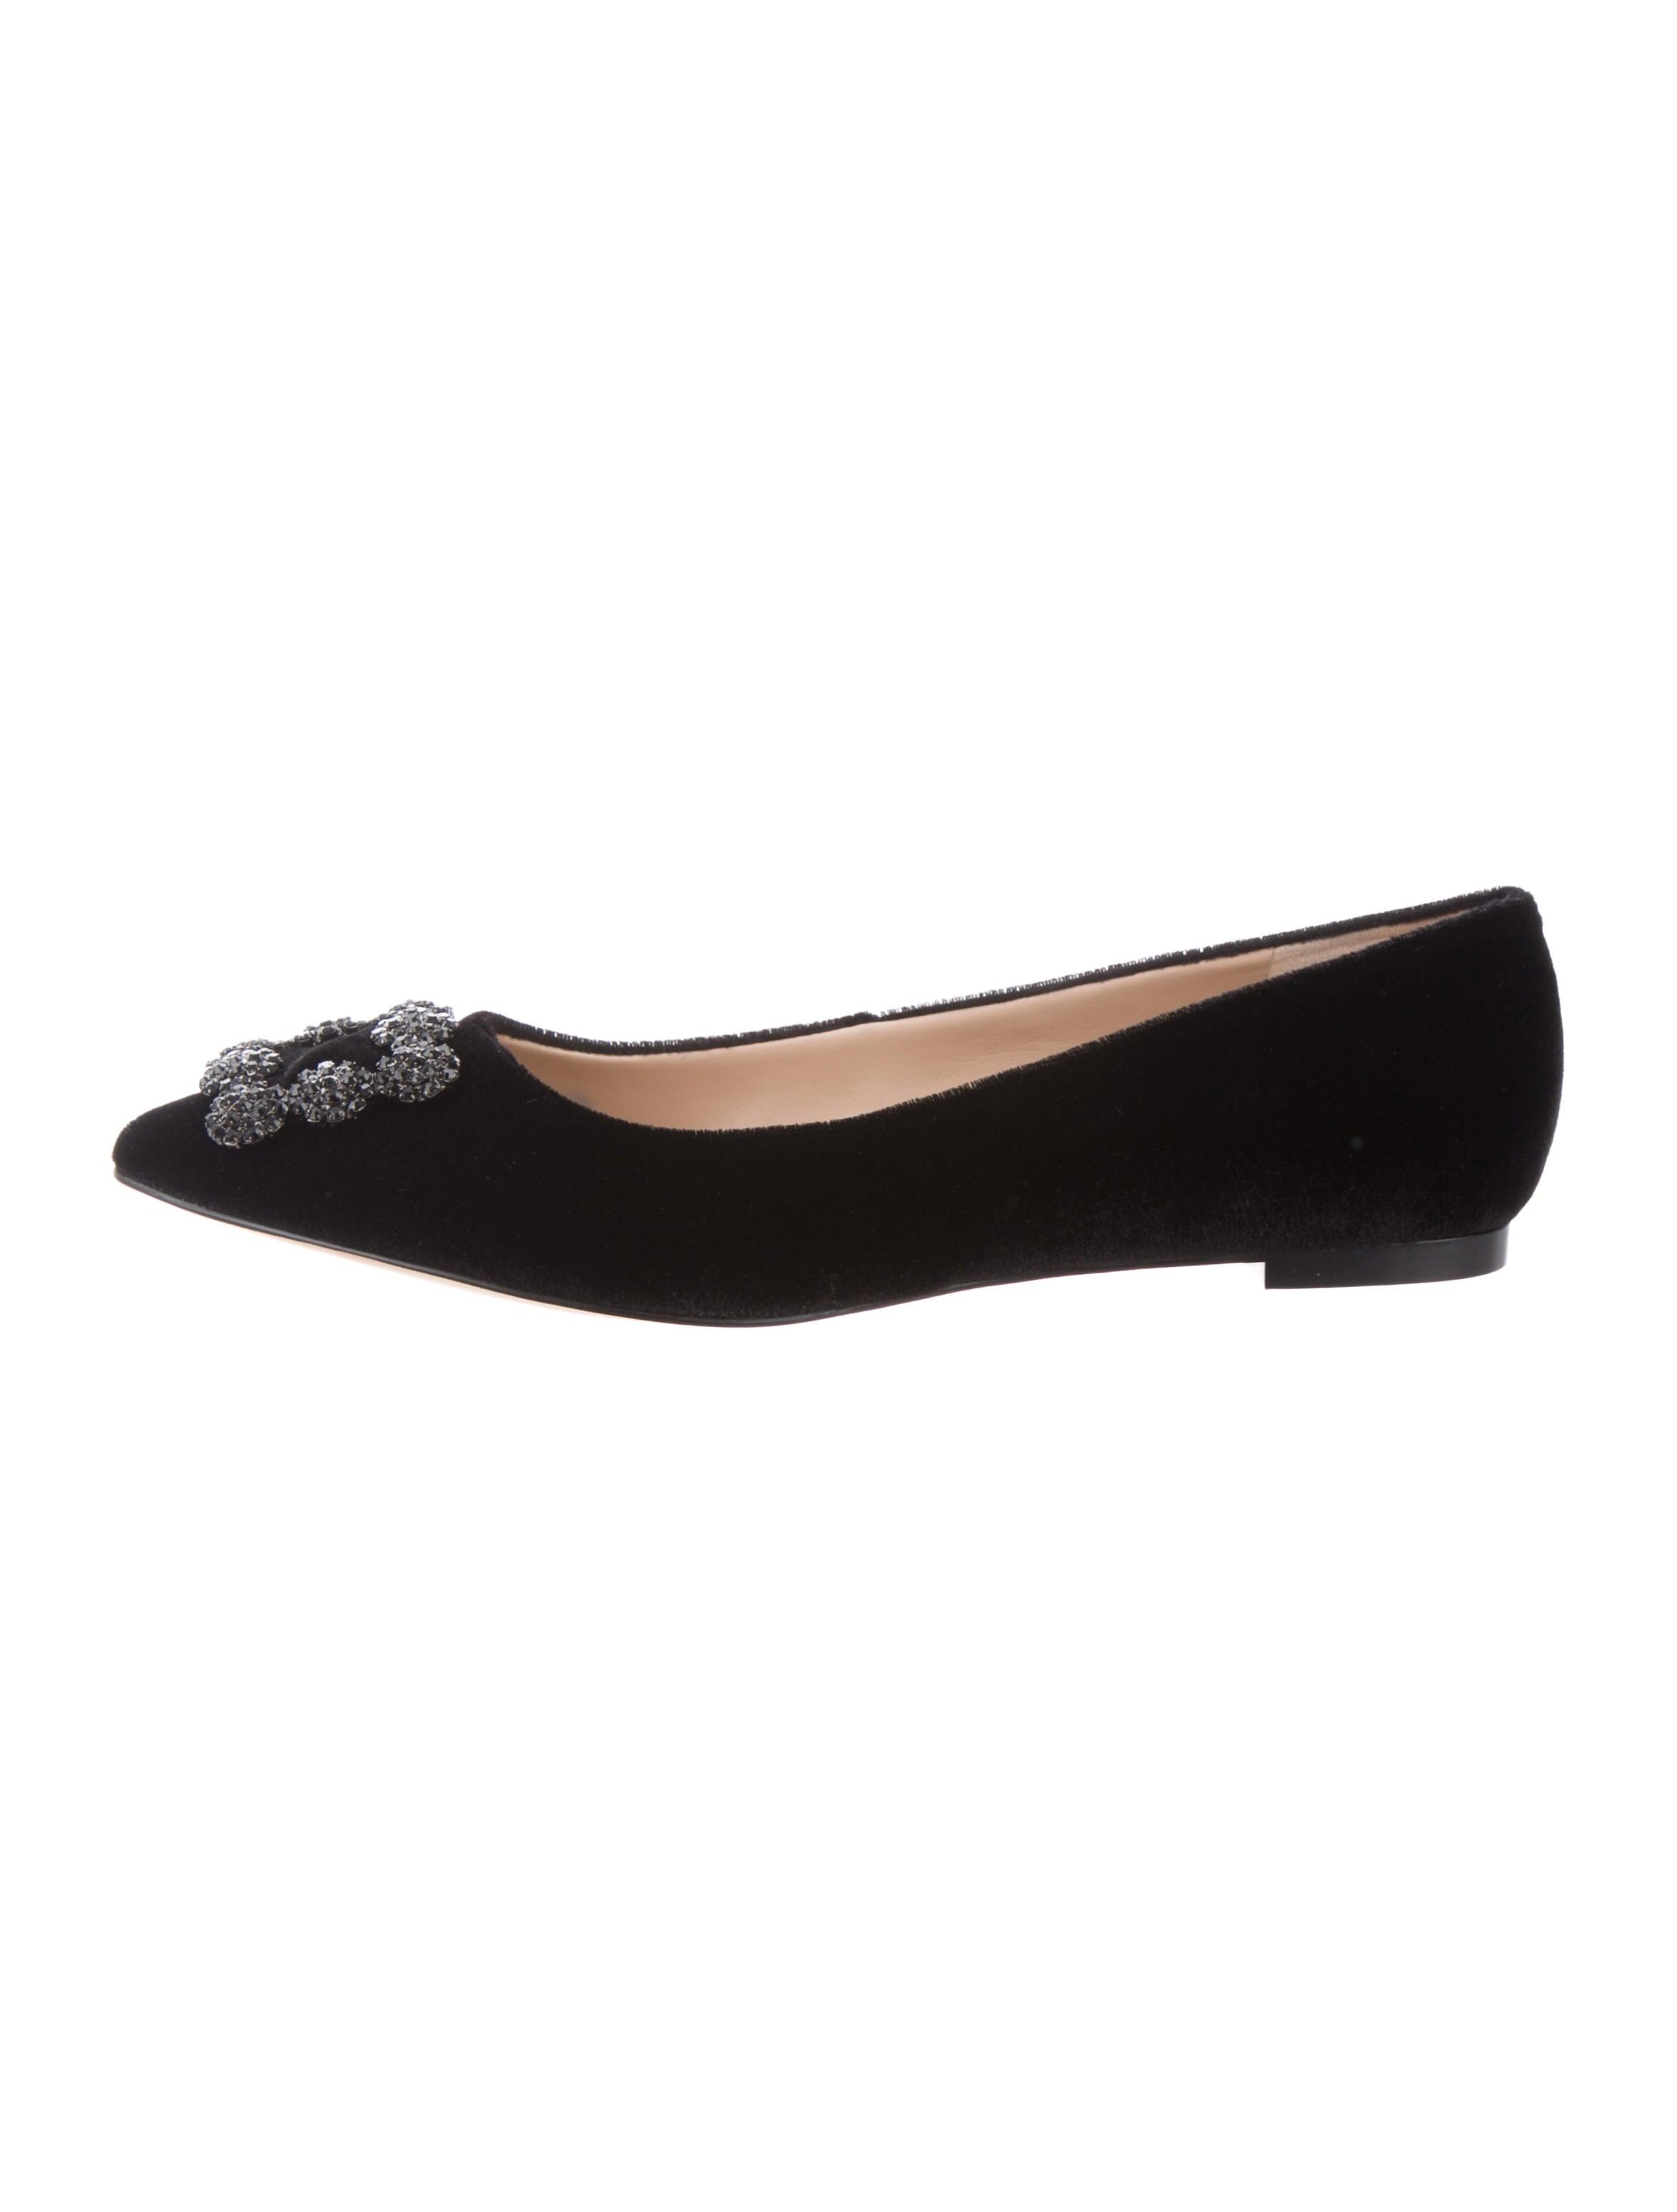 66c333e64704 Karl Lagerfeld Nara Velvet Flats w  Tags - Shoes - KAL20716